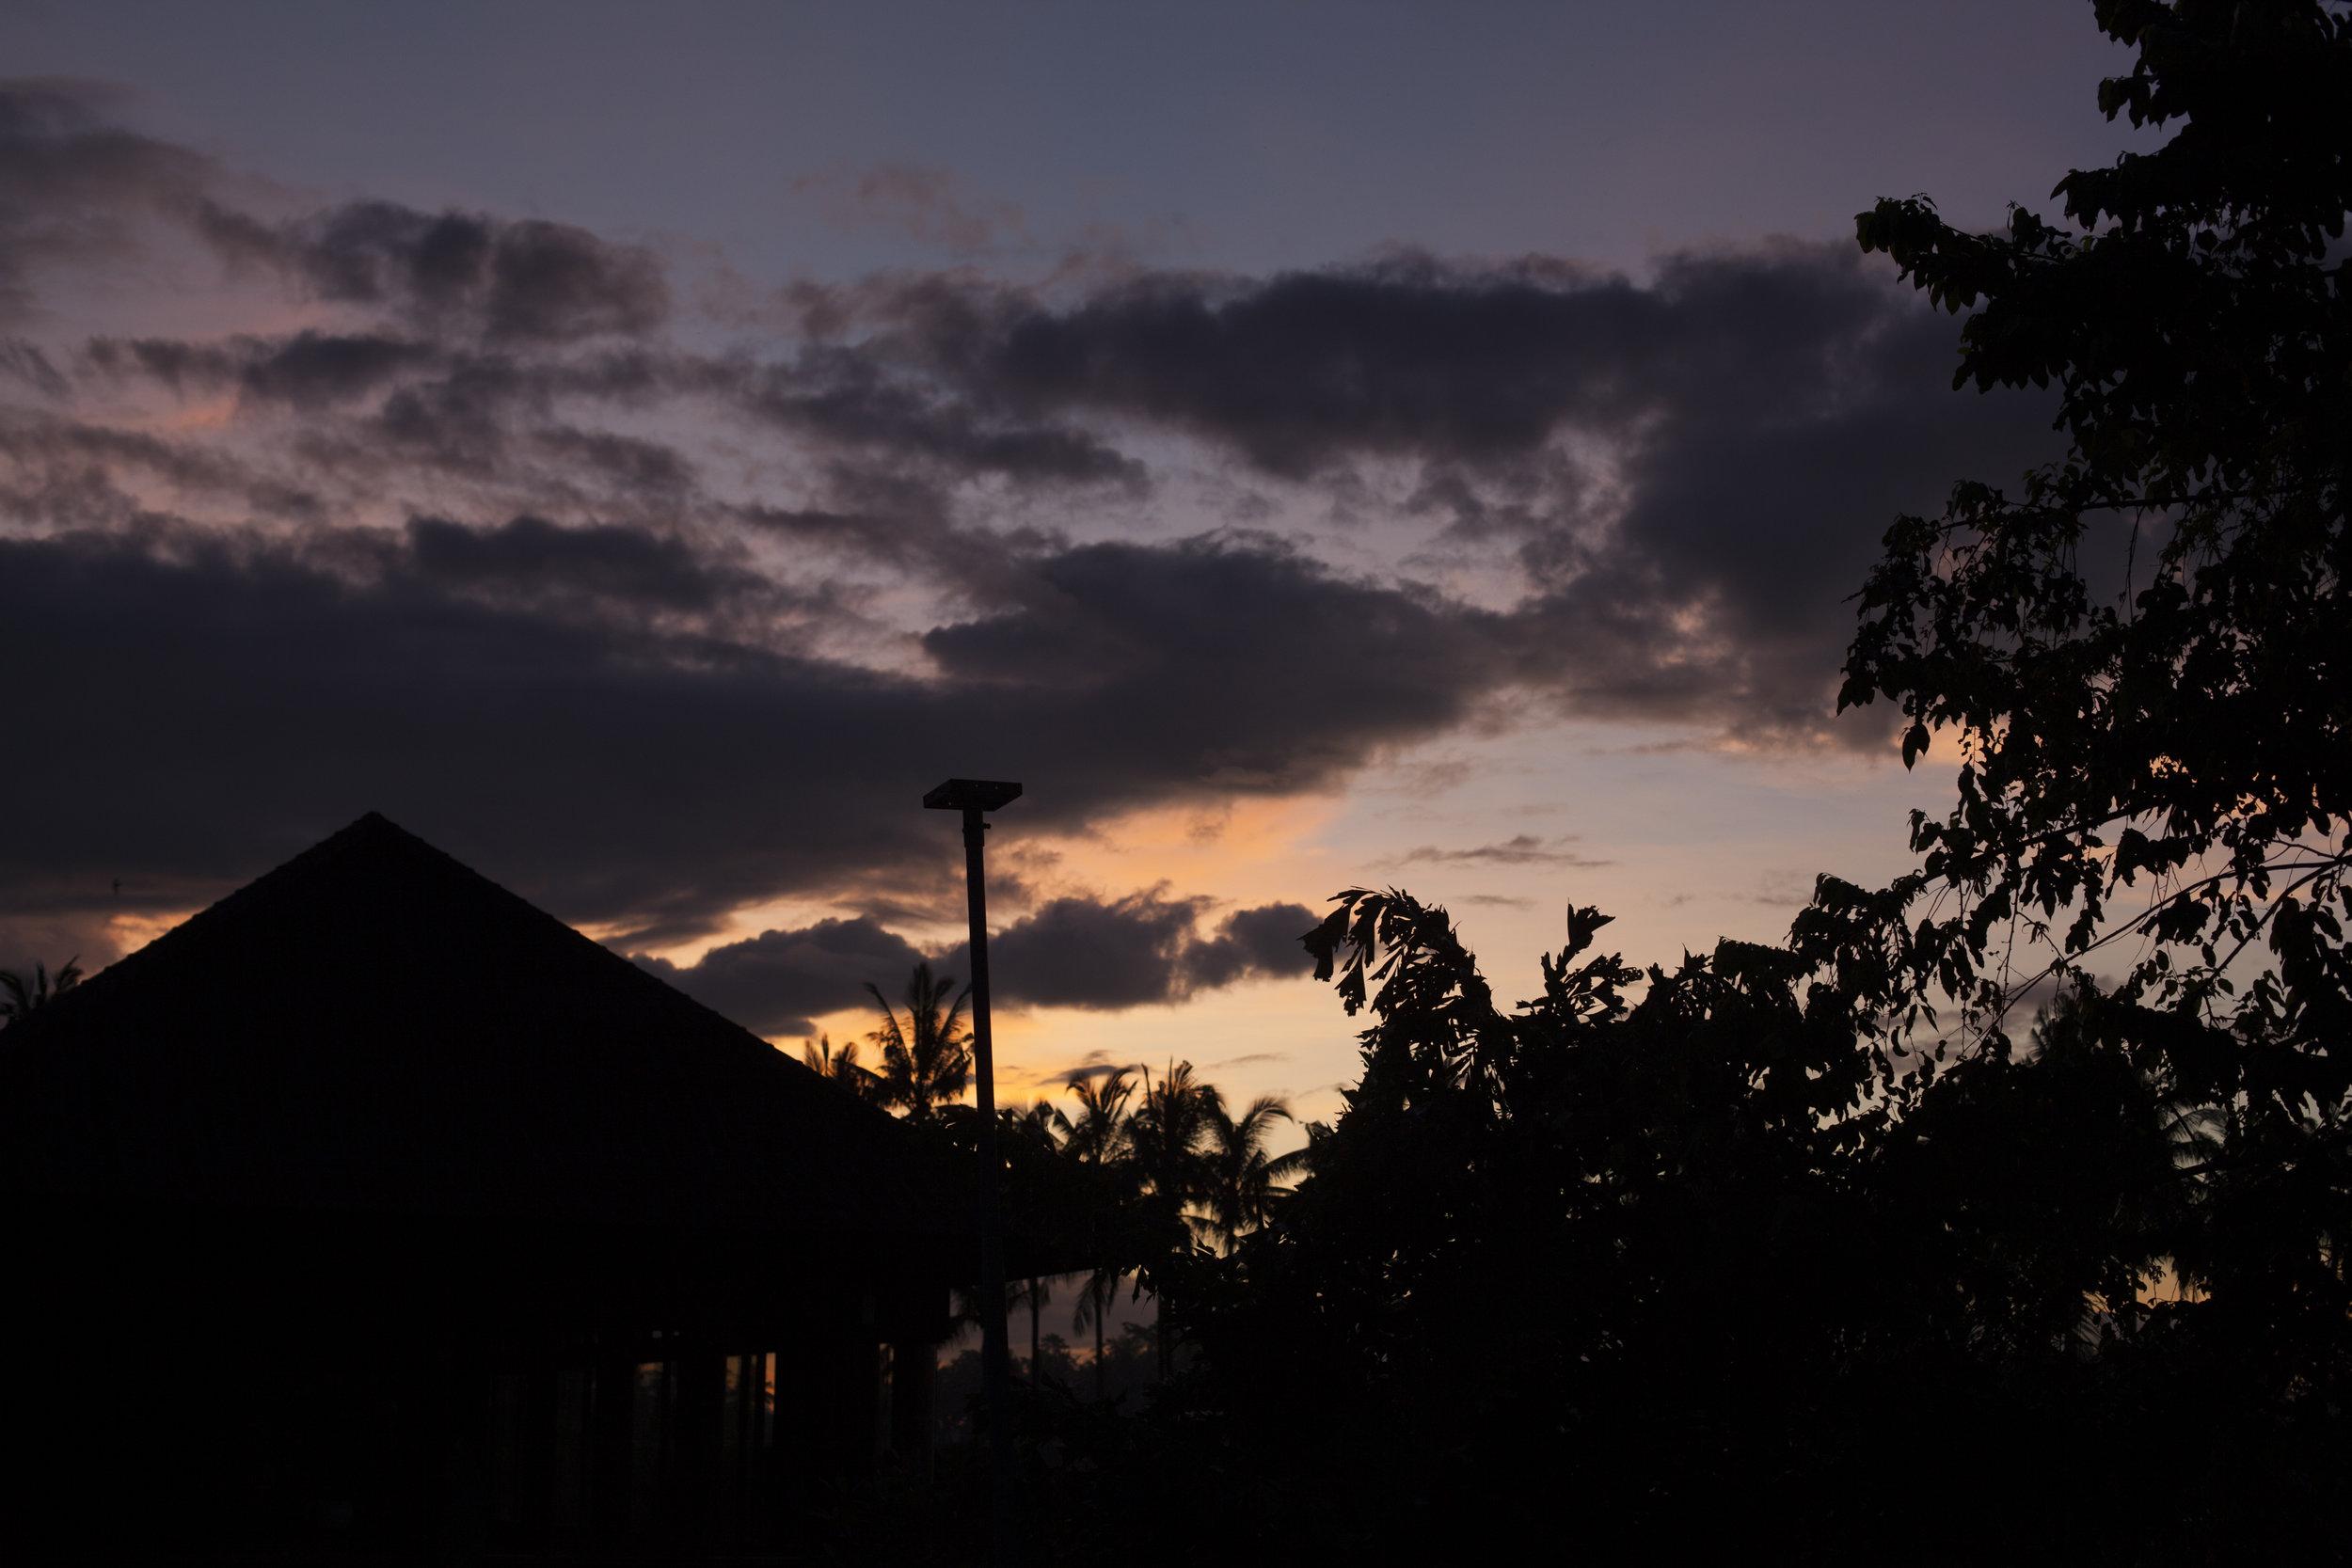 Bali_Day_2-012.jpg